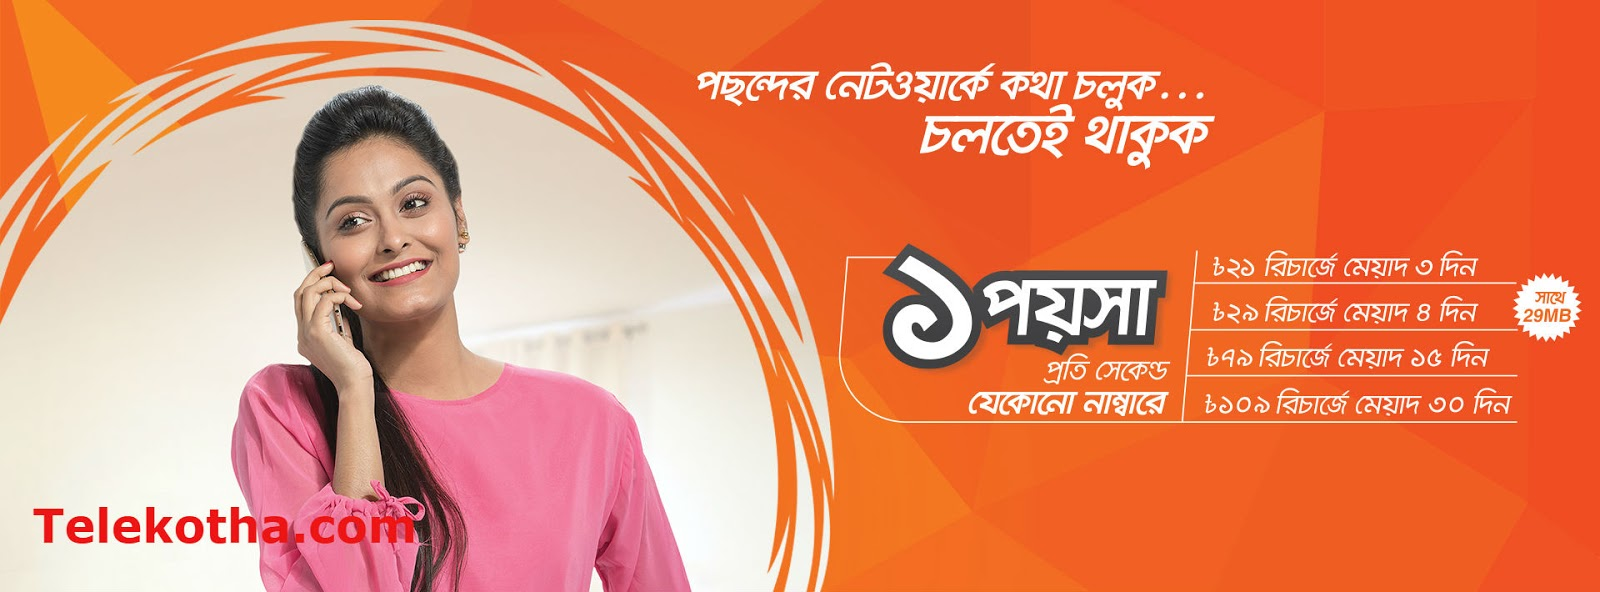 Banglalink 1p/1sec Tariff Offer